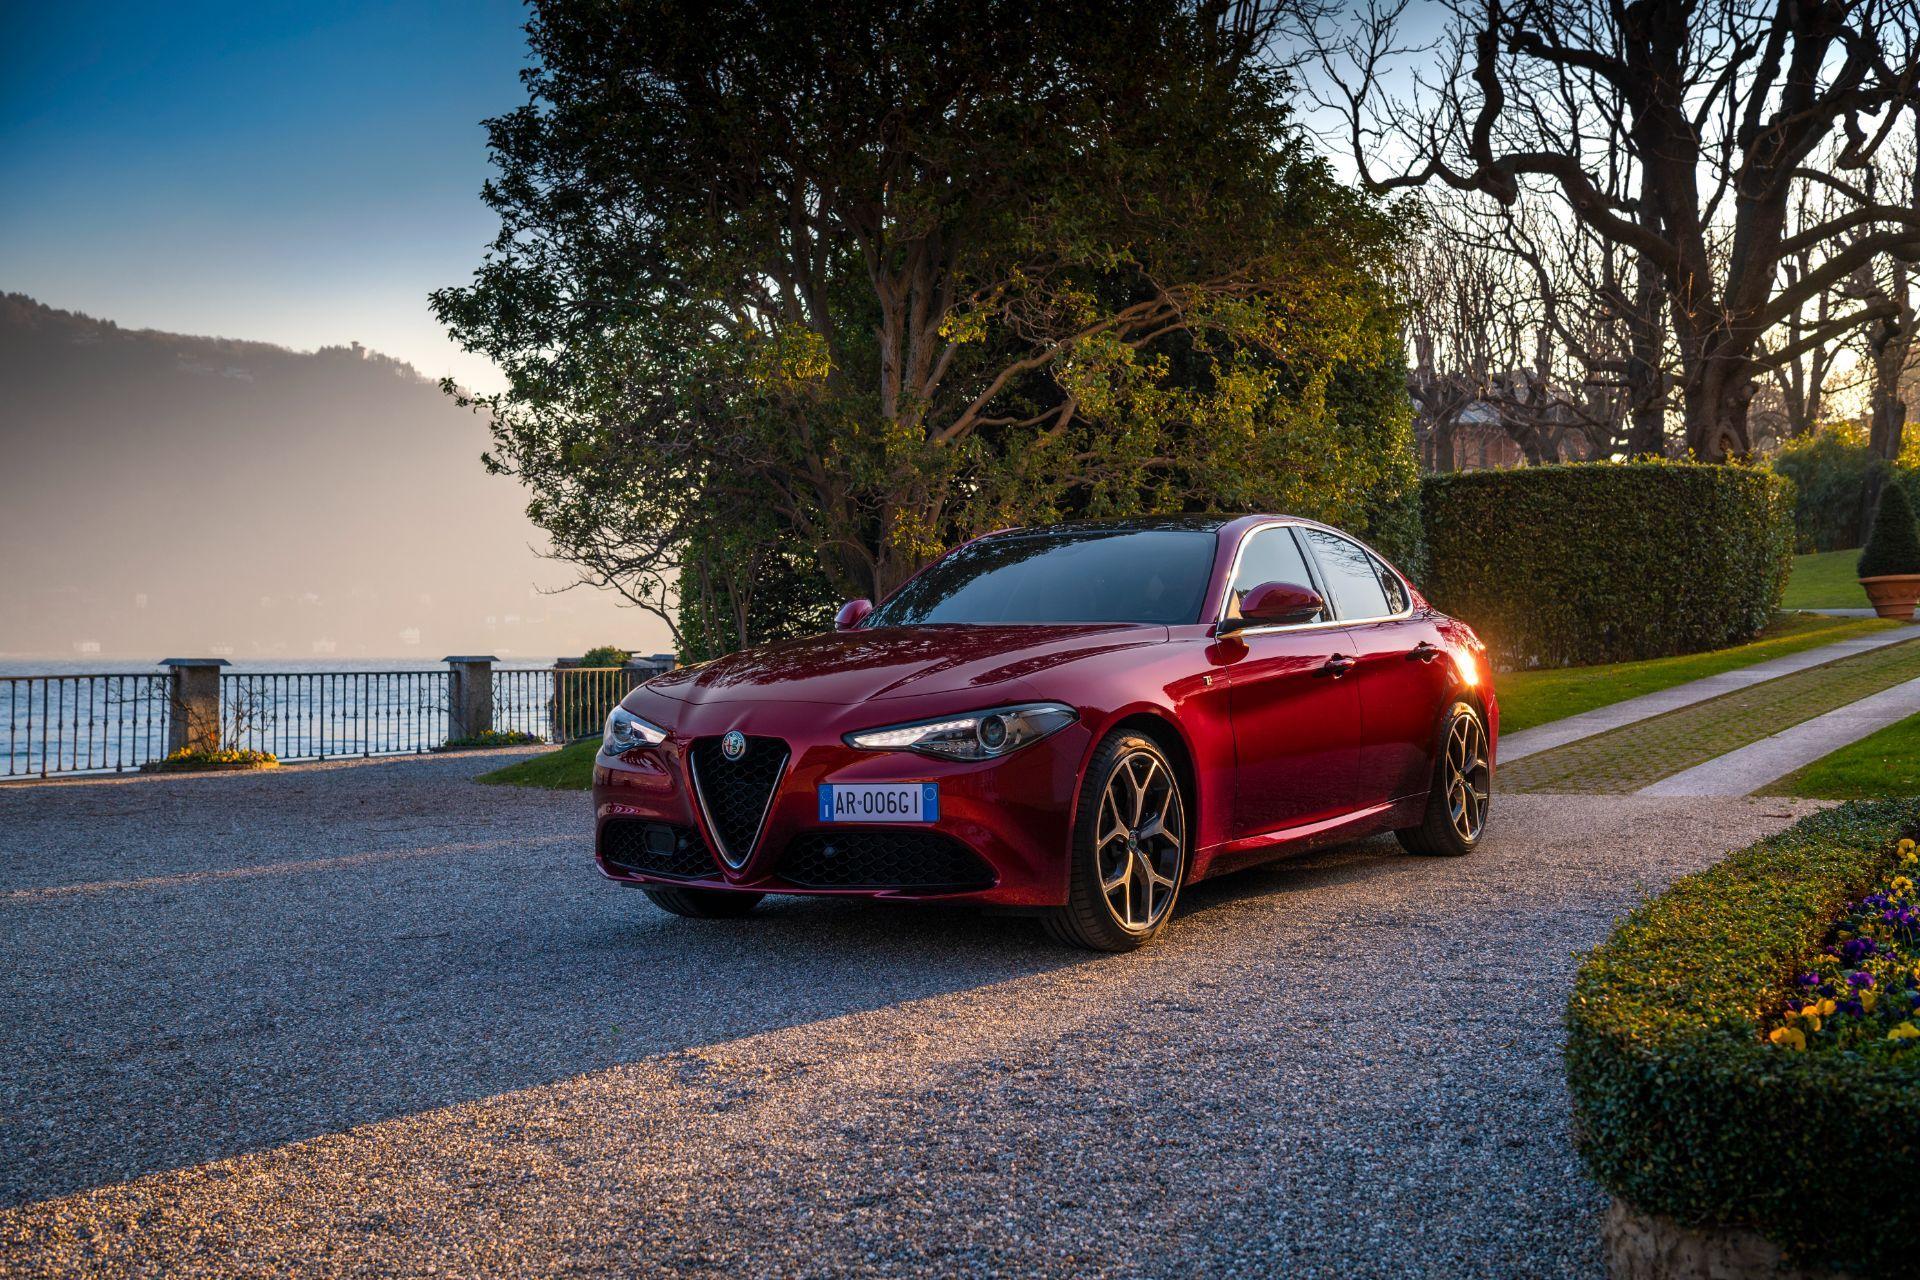 Alfa-Romeo-Giulia-and-Stelvio-6C-Villa-dEste-16